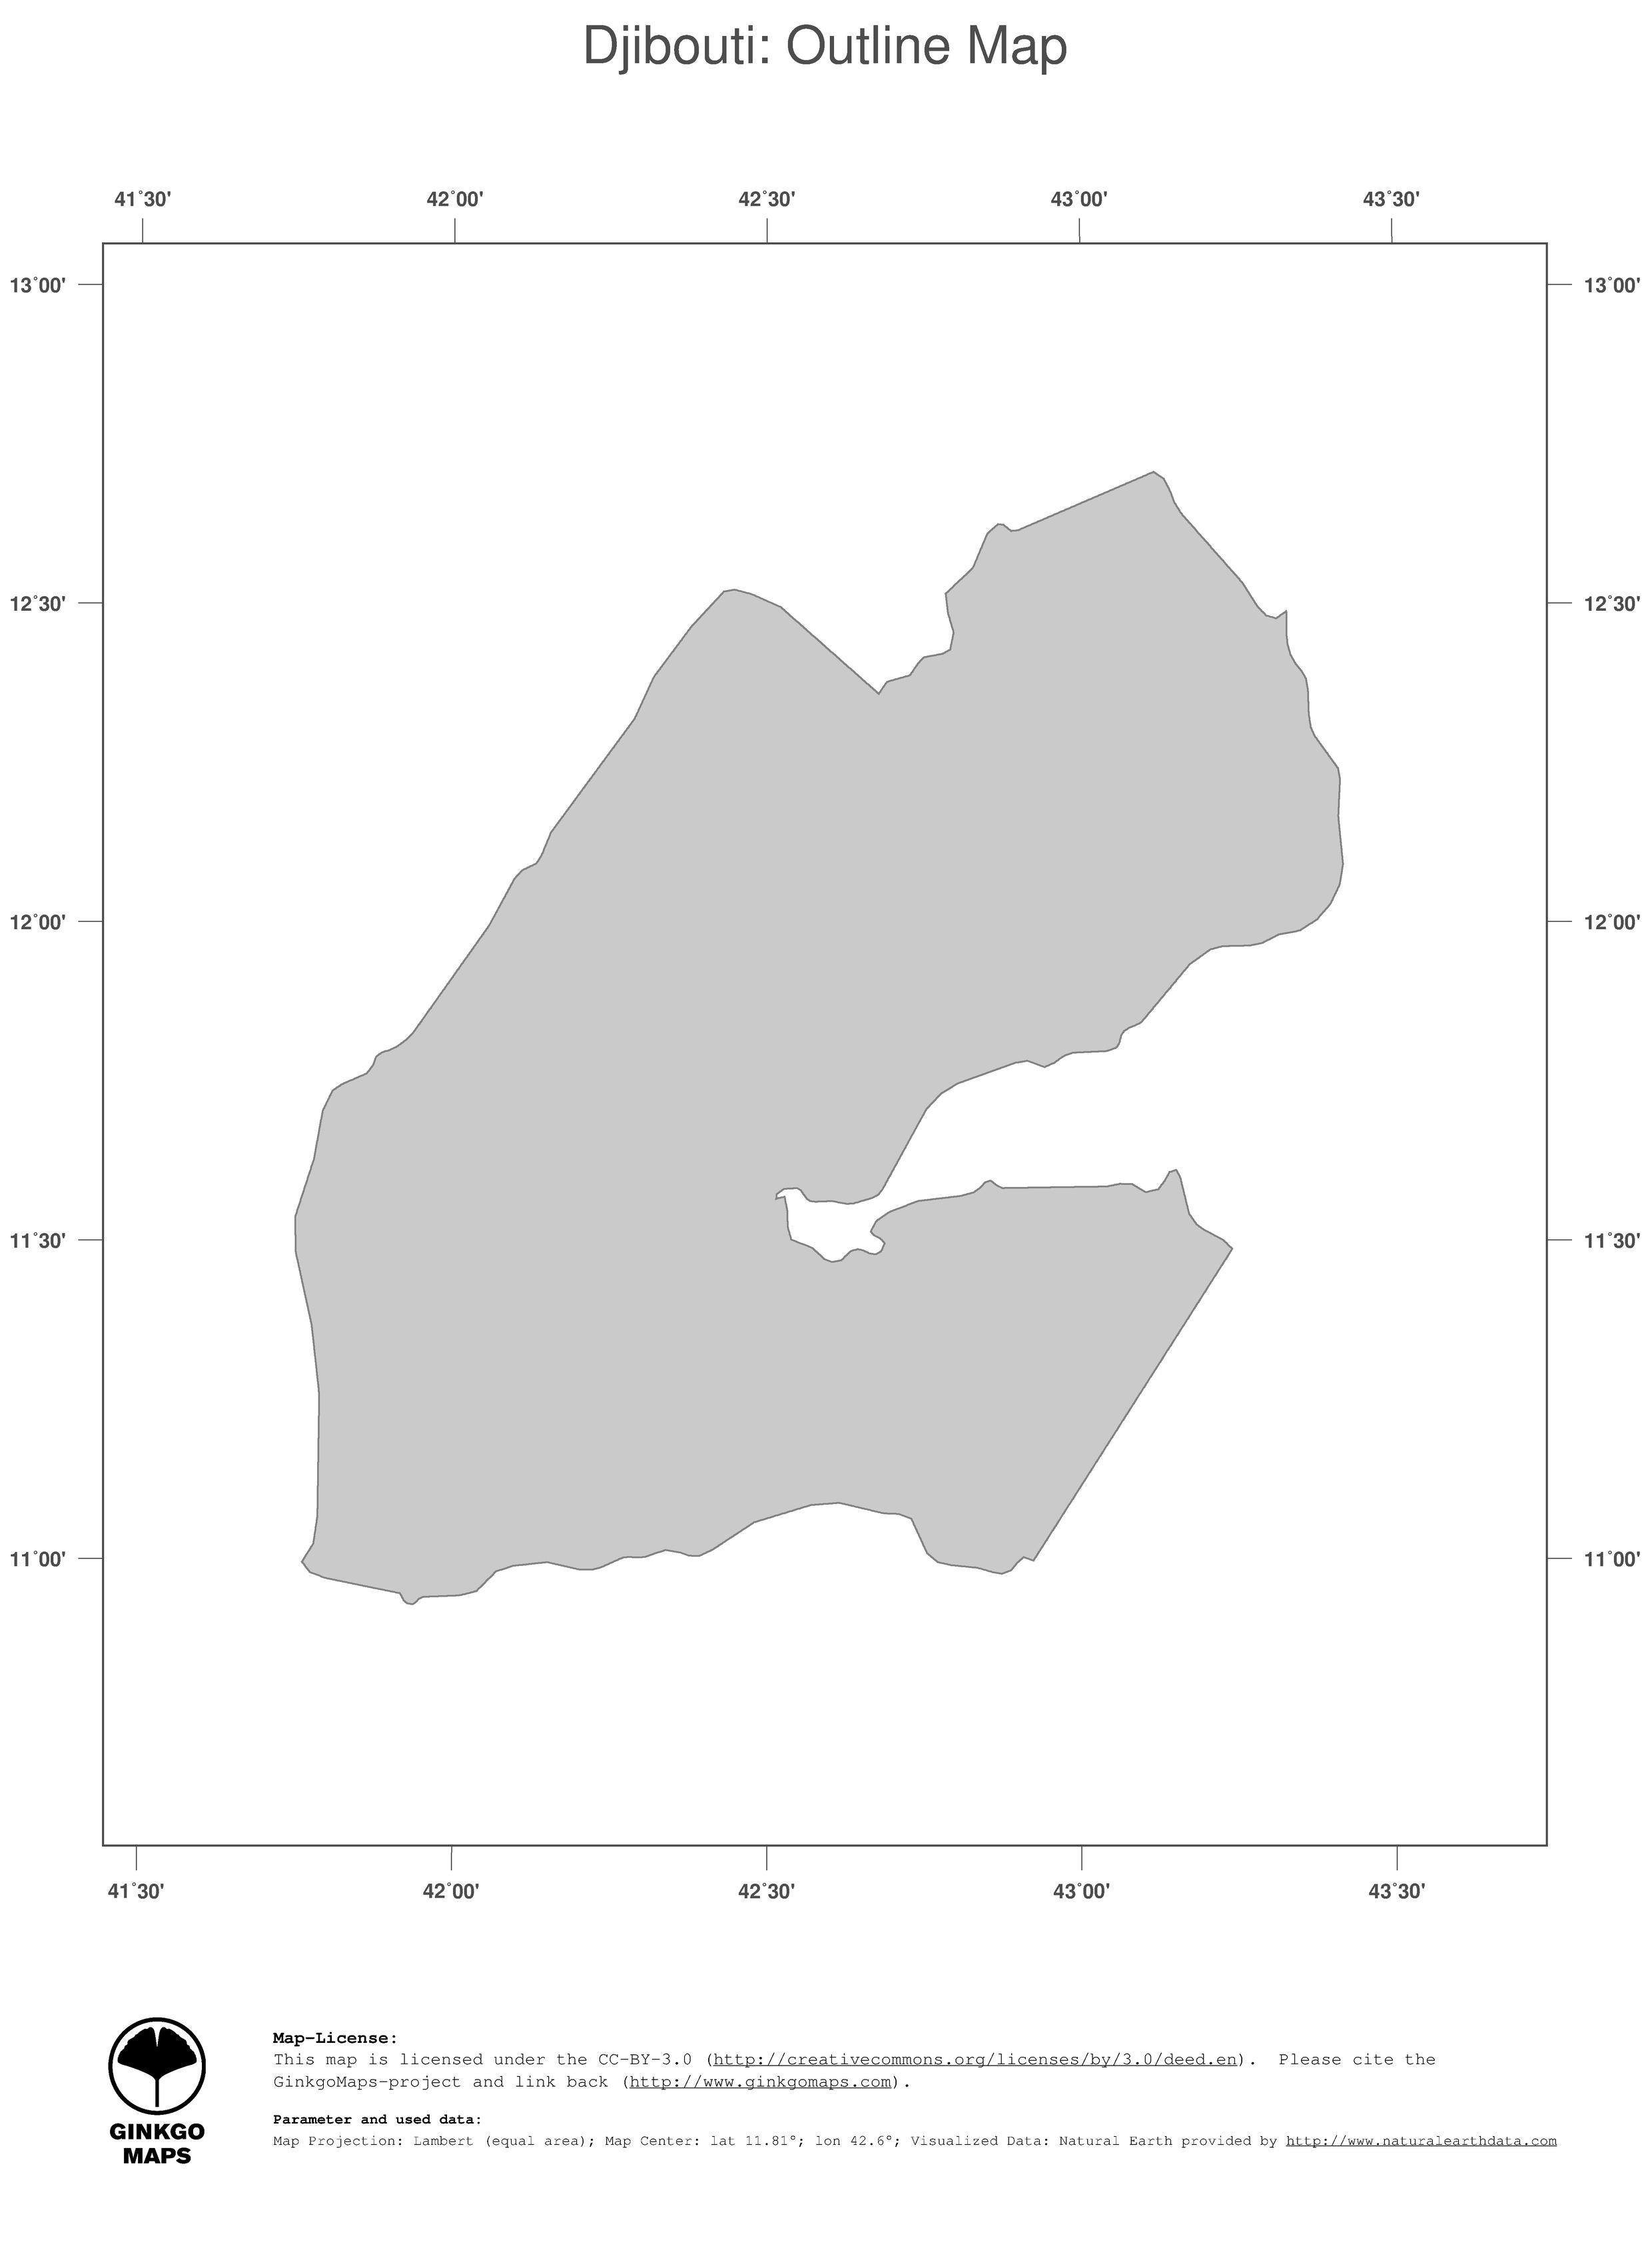 Map Djibouti GinkgoMaps Continent Africa Region Djibouti - Djibouti maps with countries